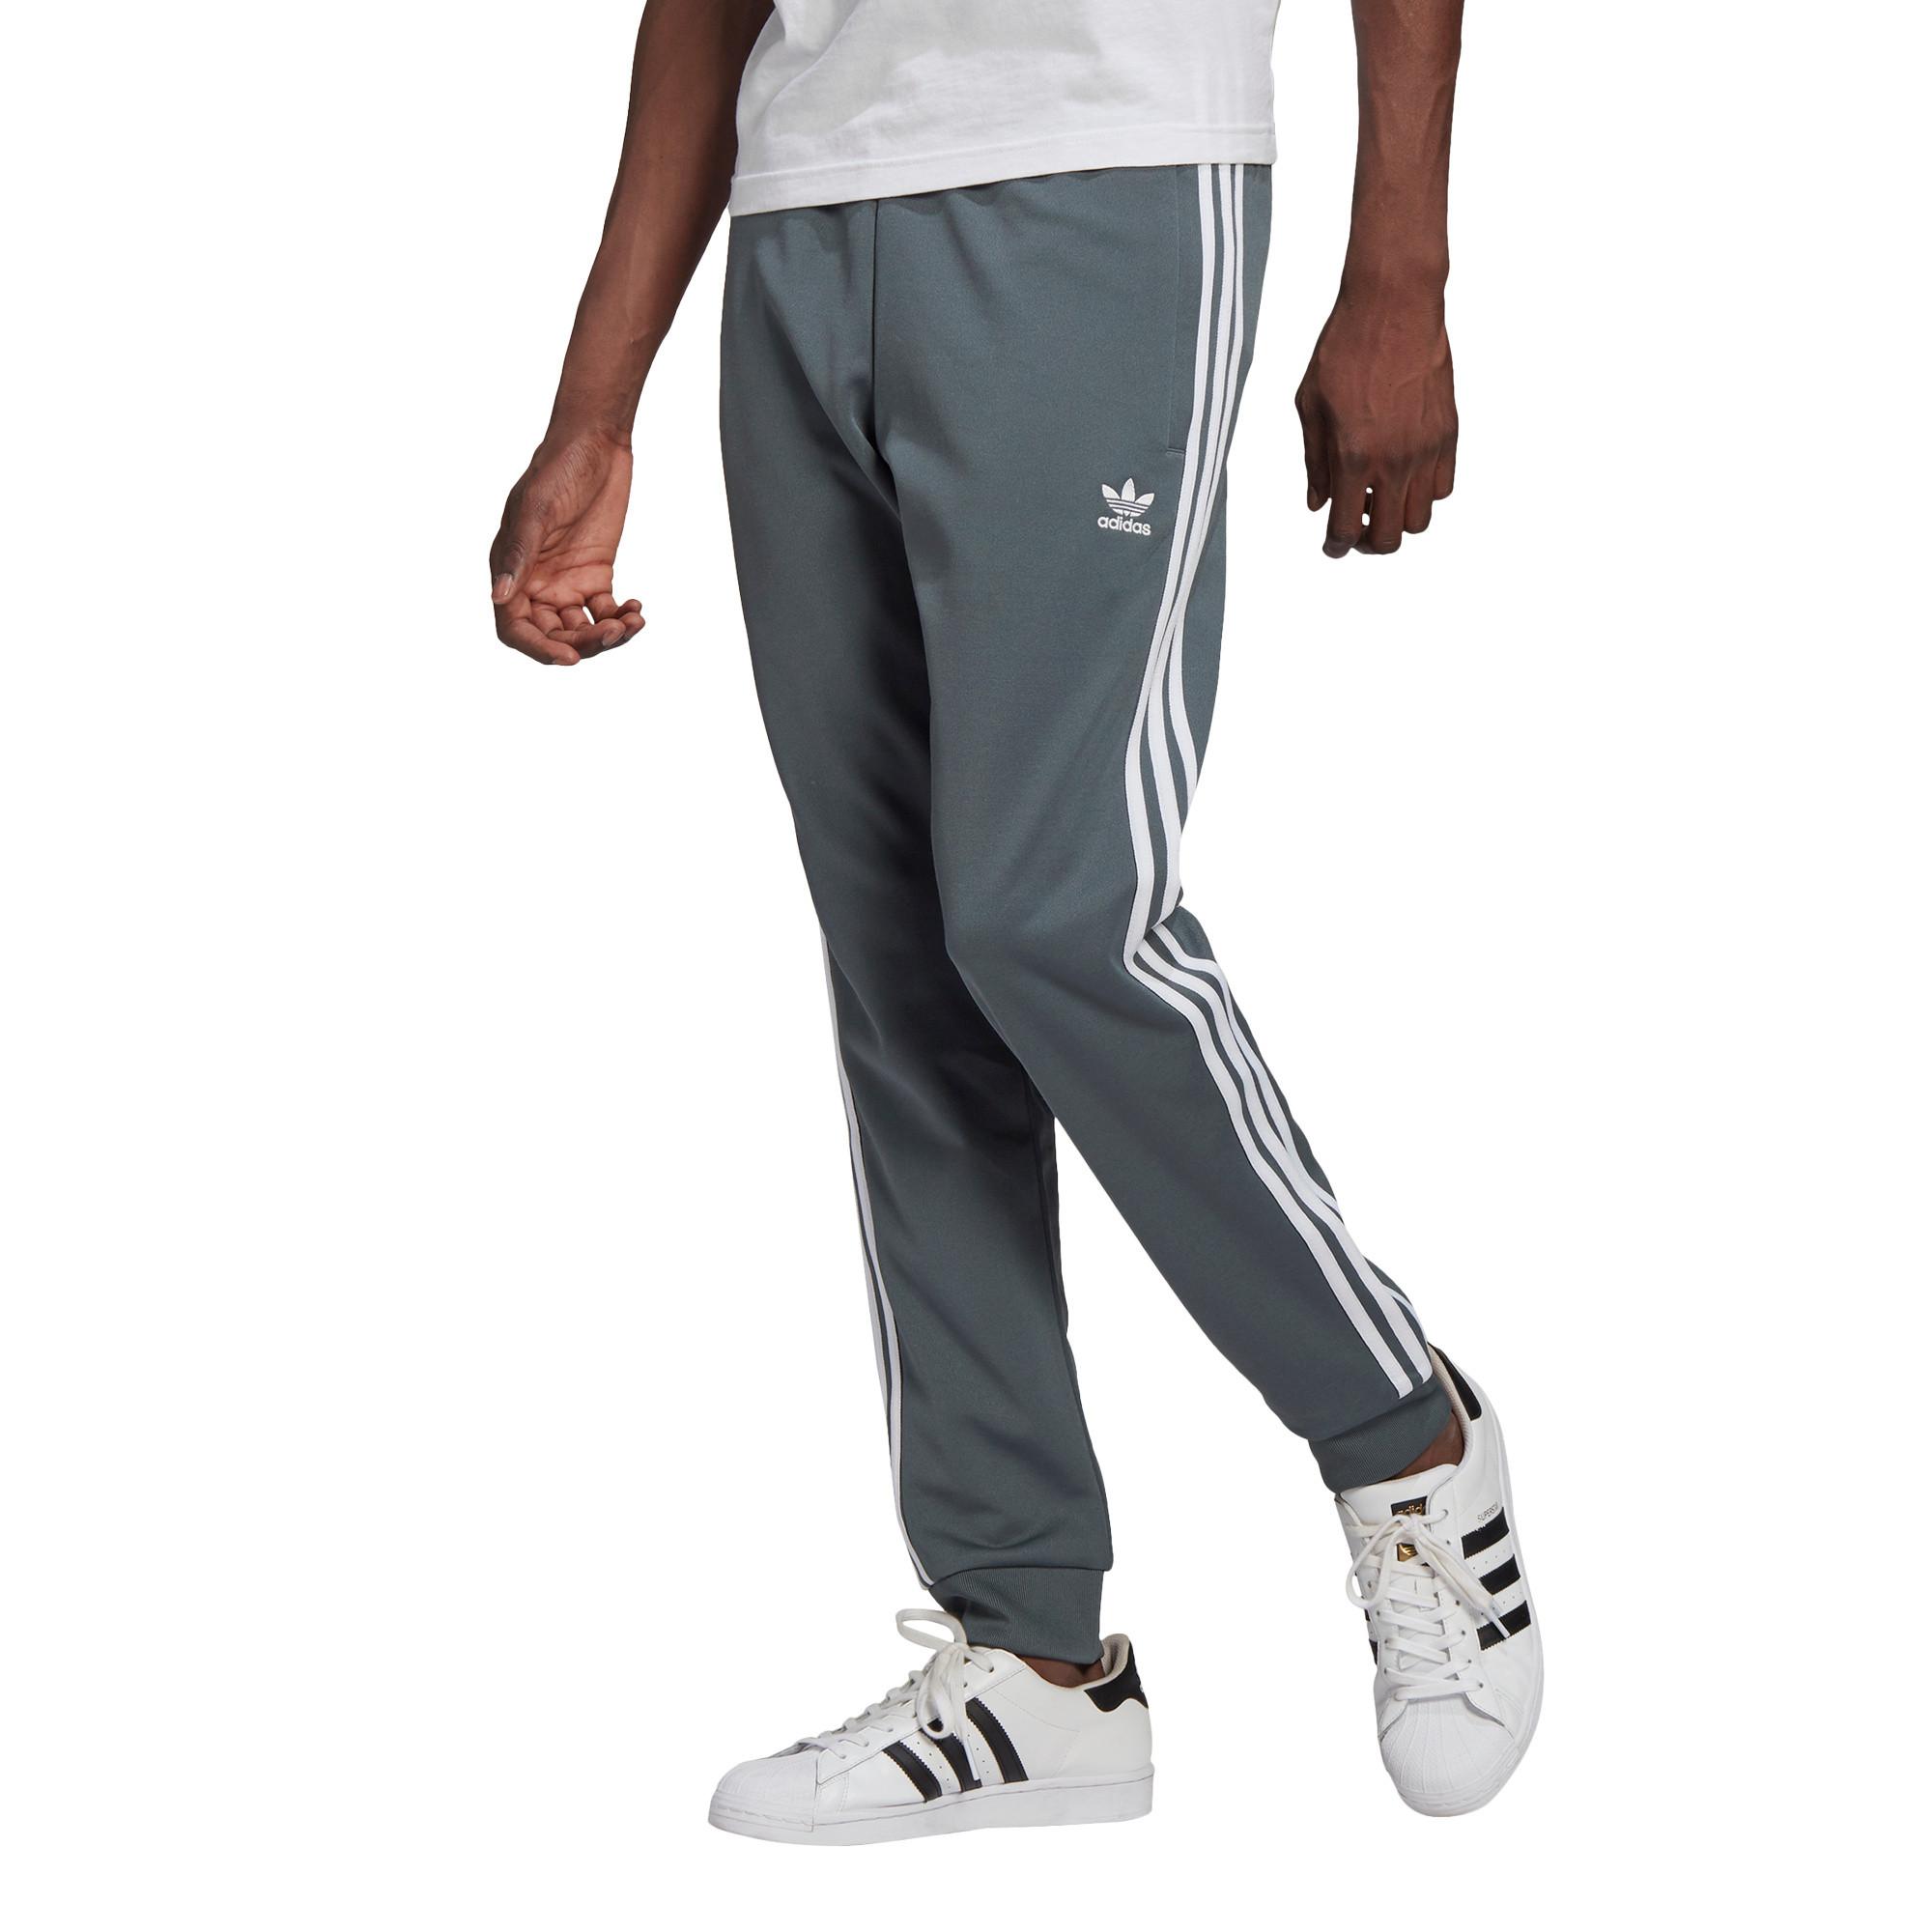 Pantaloni tuta Adicolor Classics Primeblue SST, Blu, large image number 2